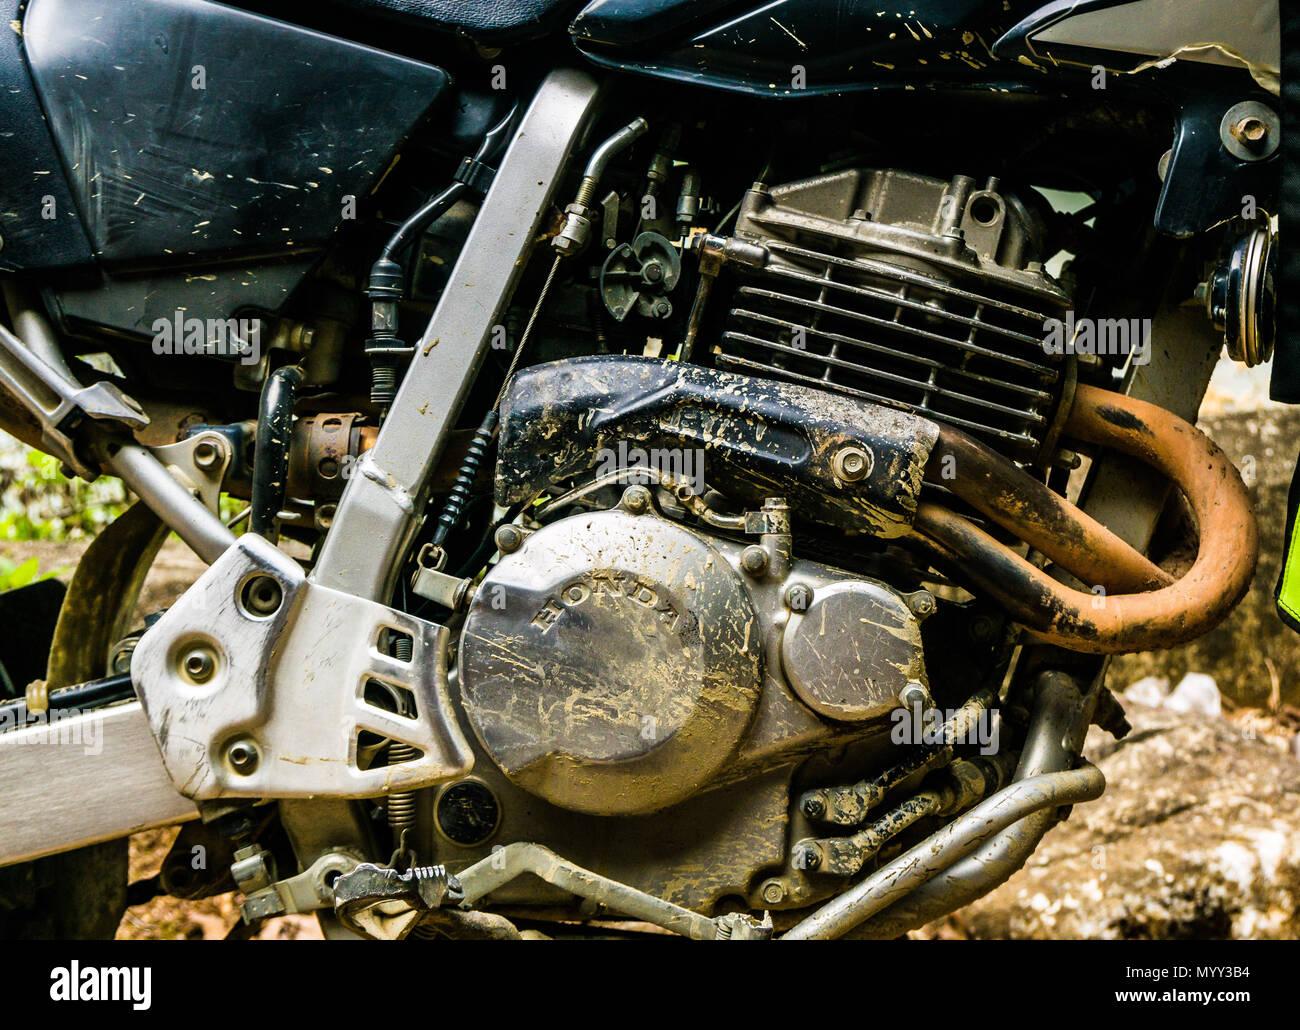 A dirt-bike engine close up.  A Honda XR250 - Stock Image